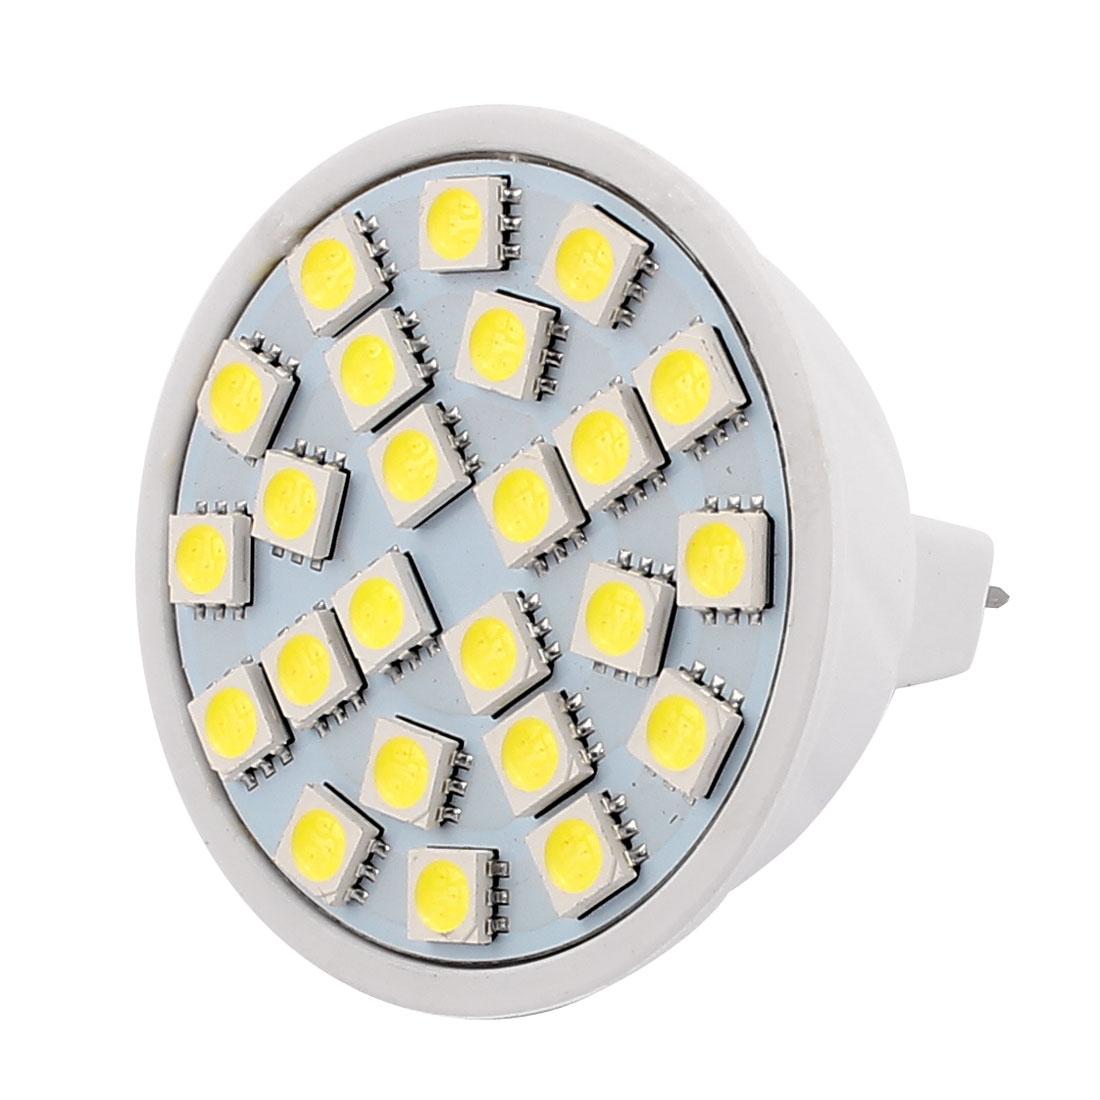 MR16 AC 220V 3W SMD 5050 24 LEDs Plastic Energy-Saving LED Lamp Bulb White